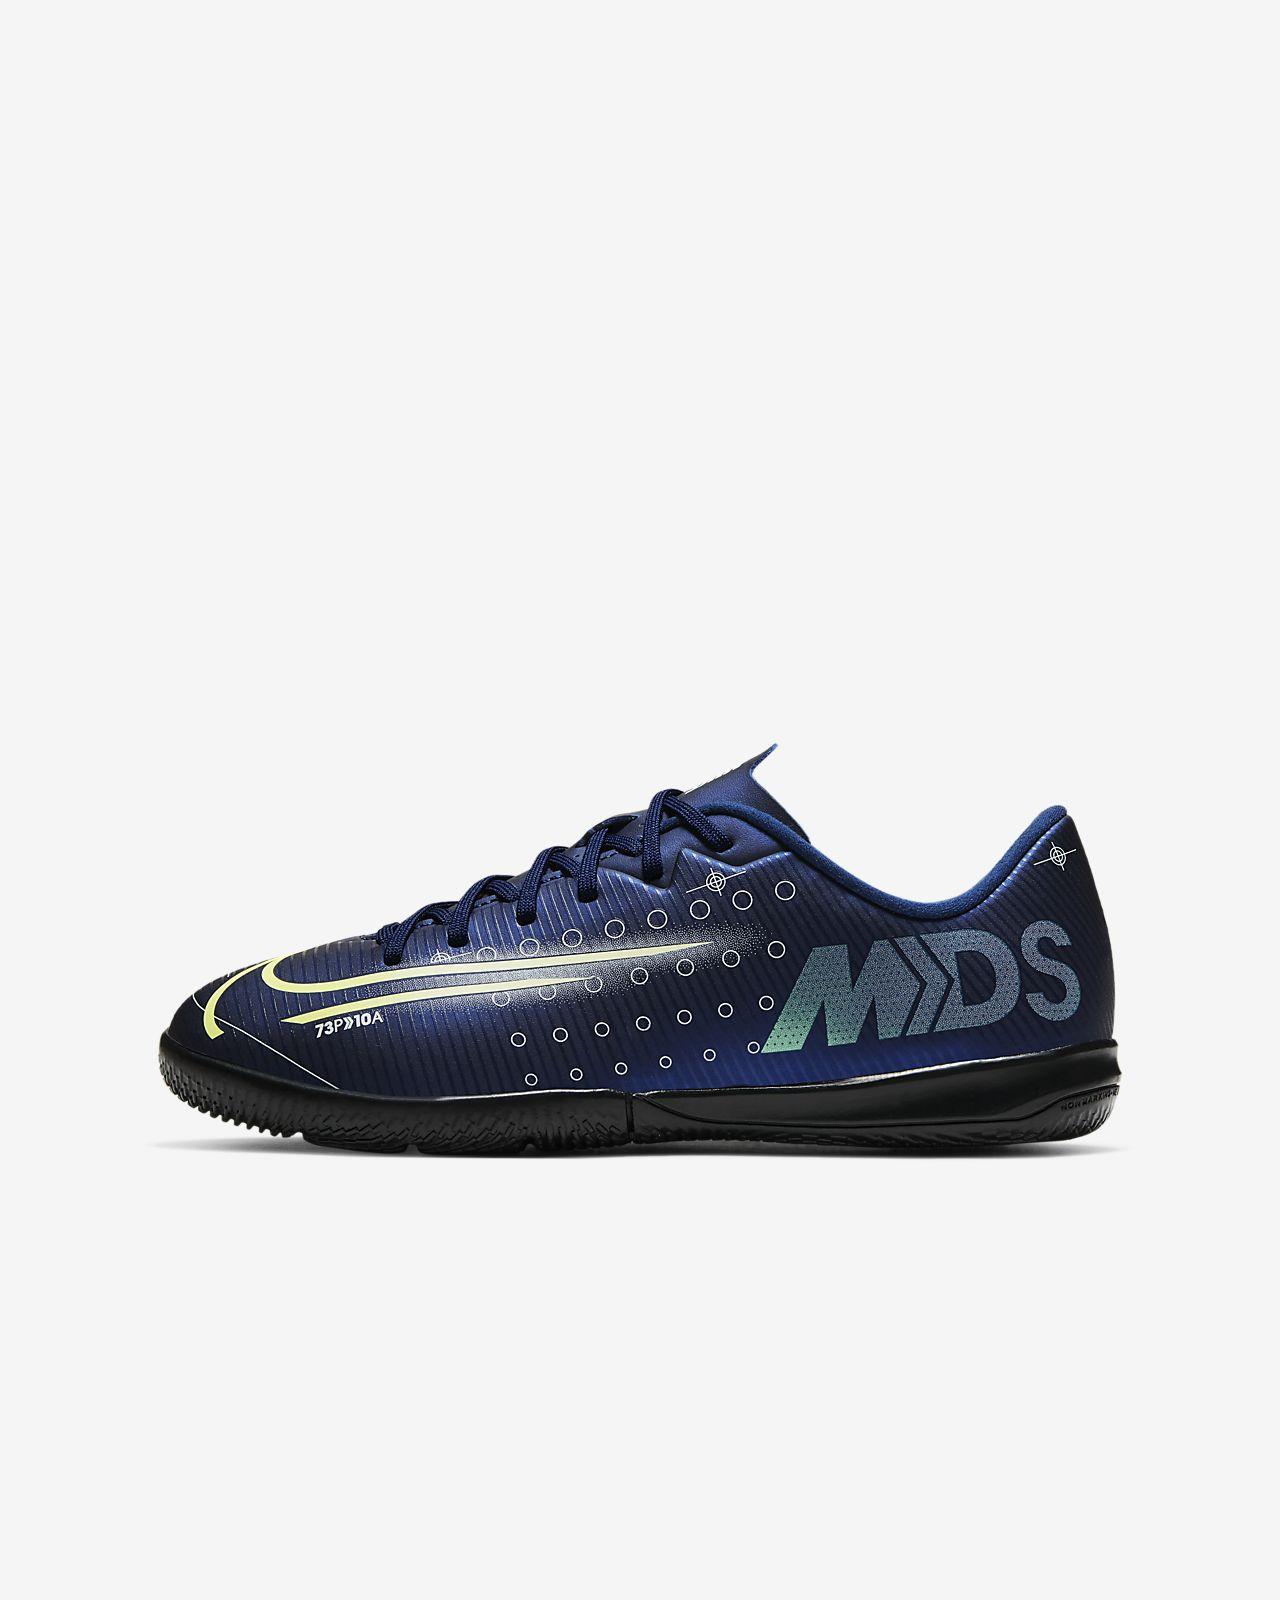 Nike Jr. Mercurial Vapor 13 Academy MDS IC Younger/Older Kids' Indoor Court Football Shoe